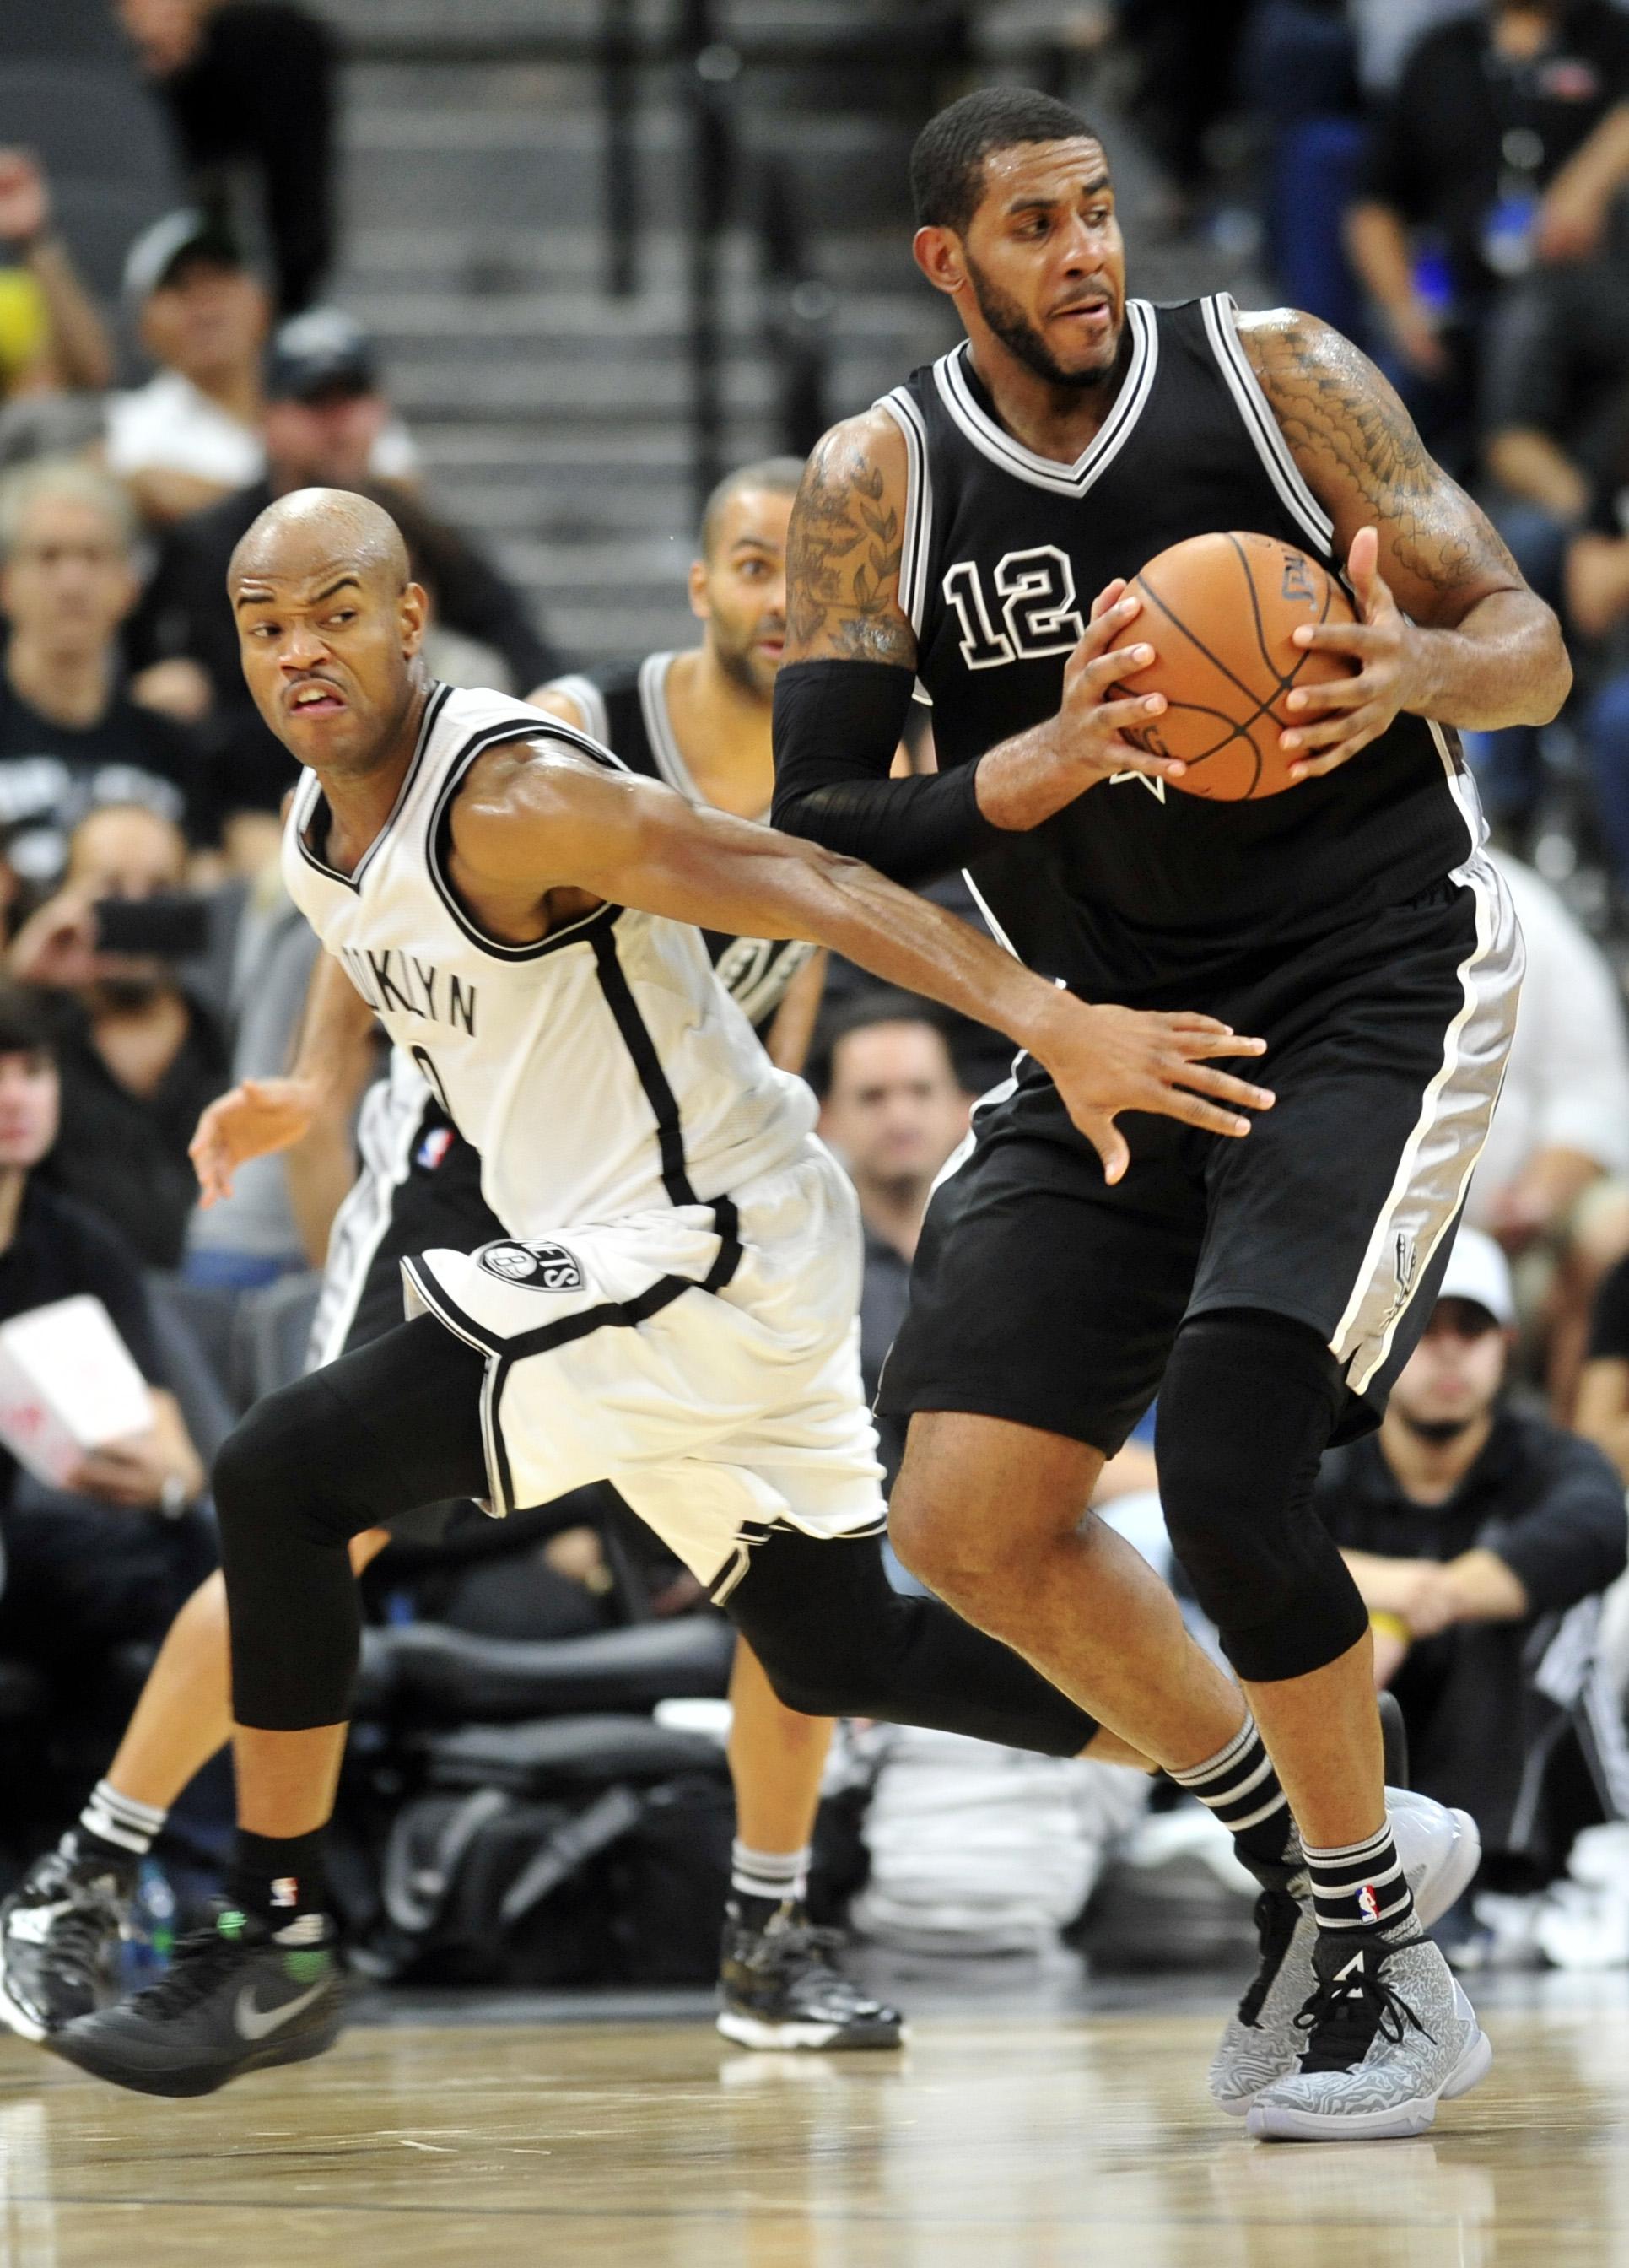 Brooklyn Nets guard Jarrett Jack, left, defends San Antonio Spurs forward LaMarcus Aldridge in the second half of an NBA basketball game Friday, Oct. 30, 2015, in San Antonio. (AP Photo/Bahram Mark Sobhani)